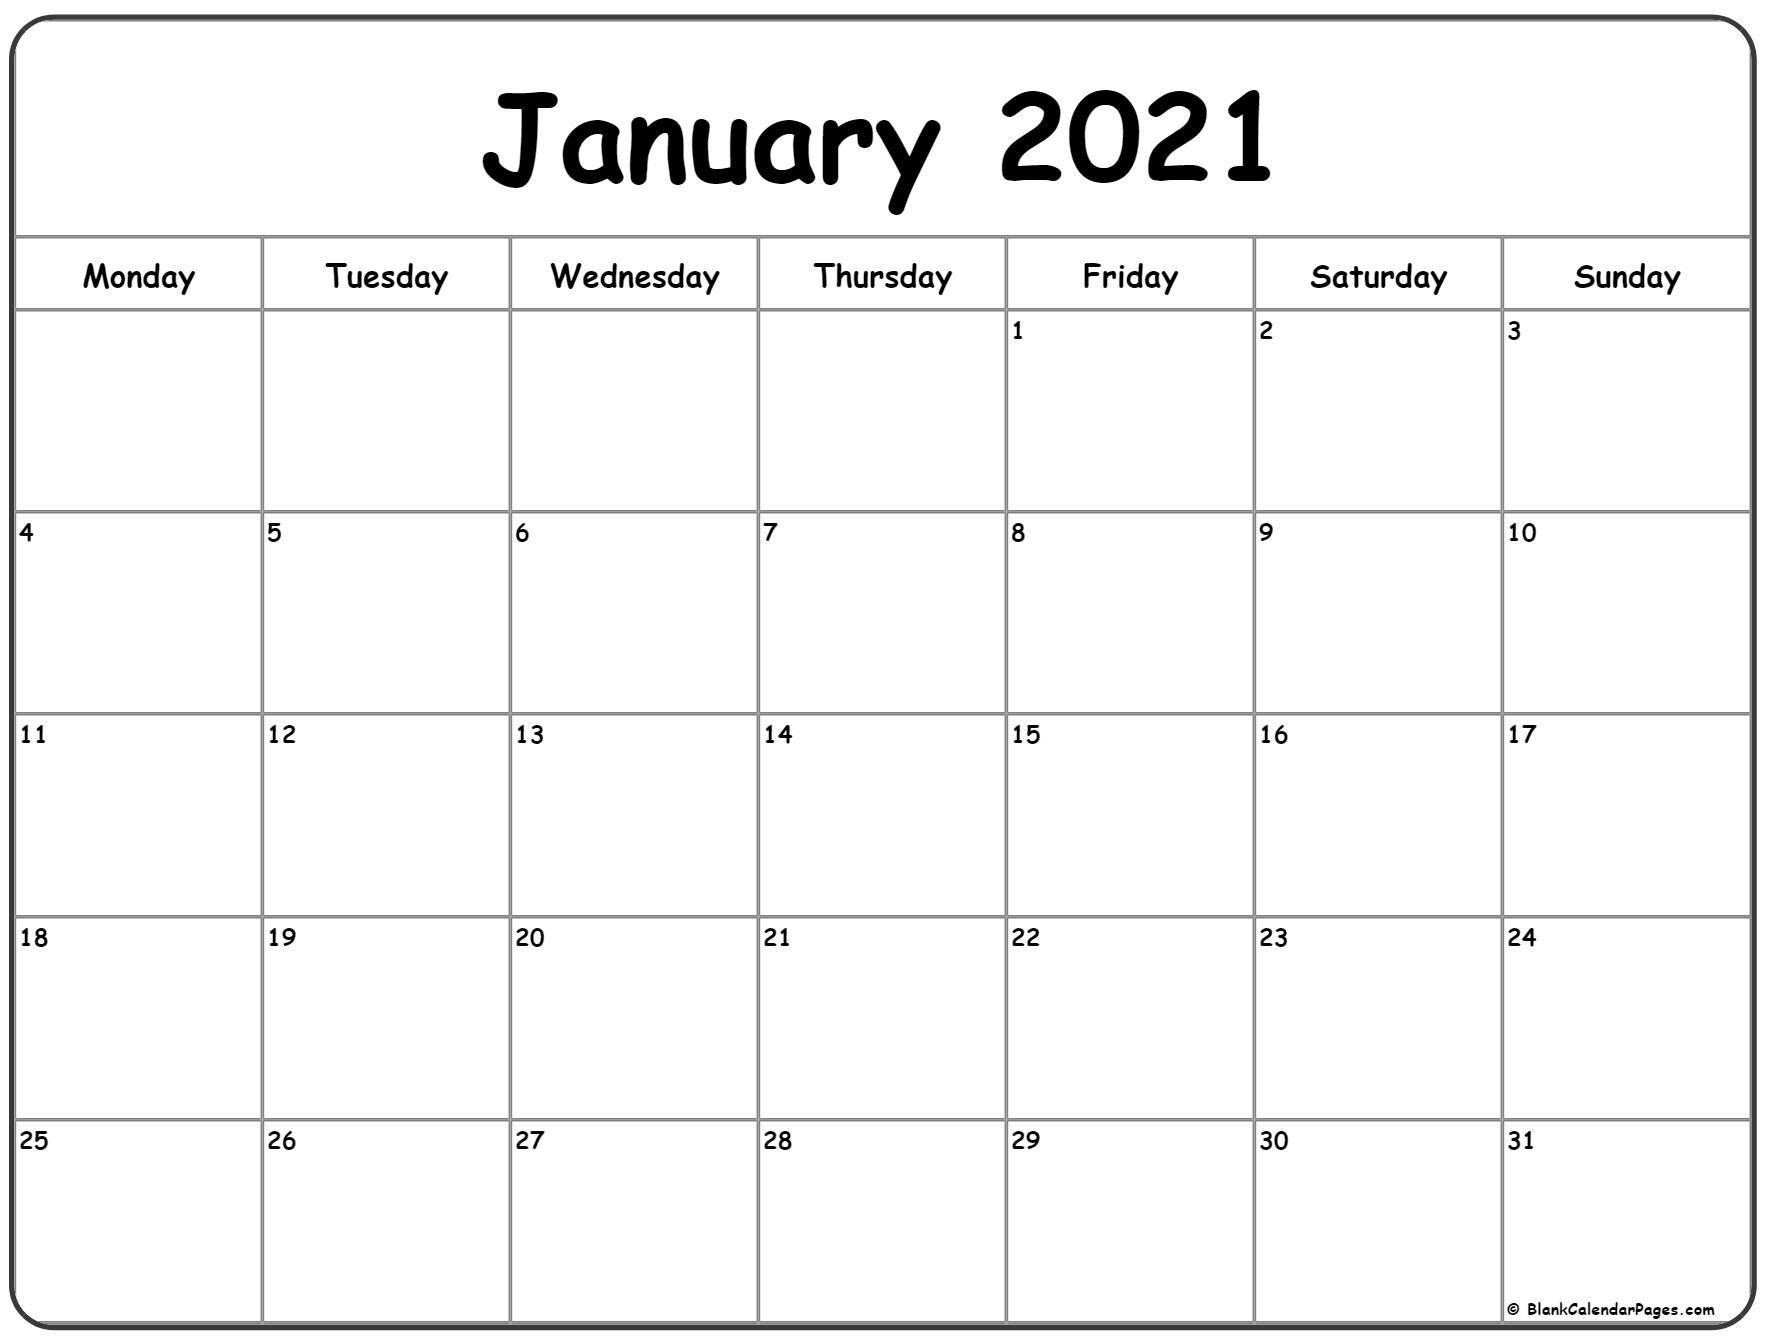 January 2021 Monday Calendar | Monday To Sunday